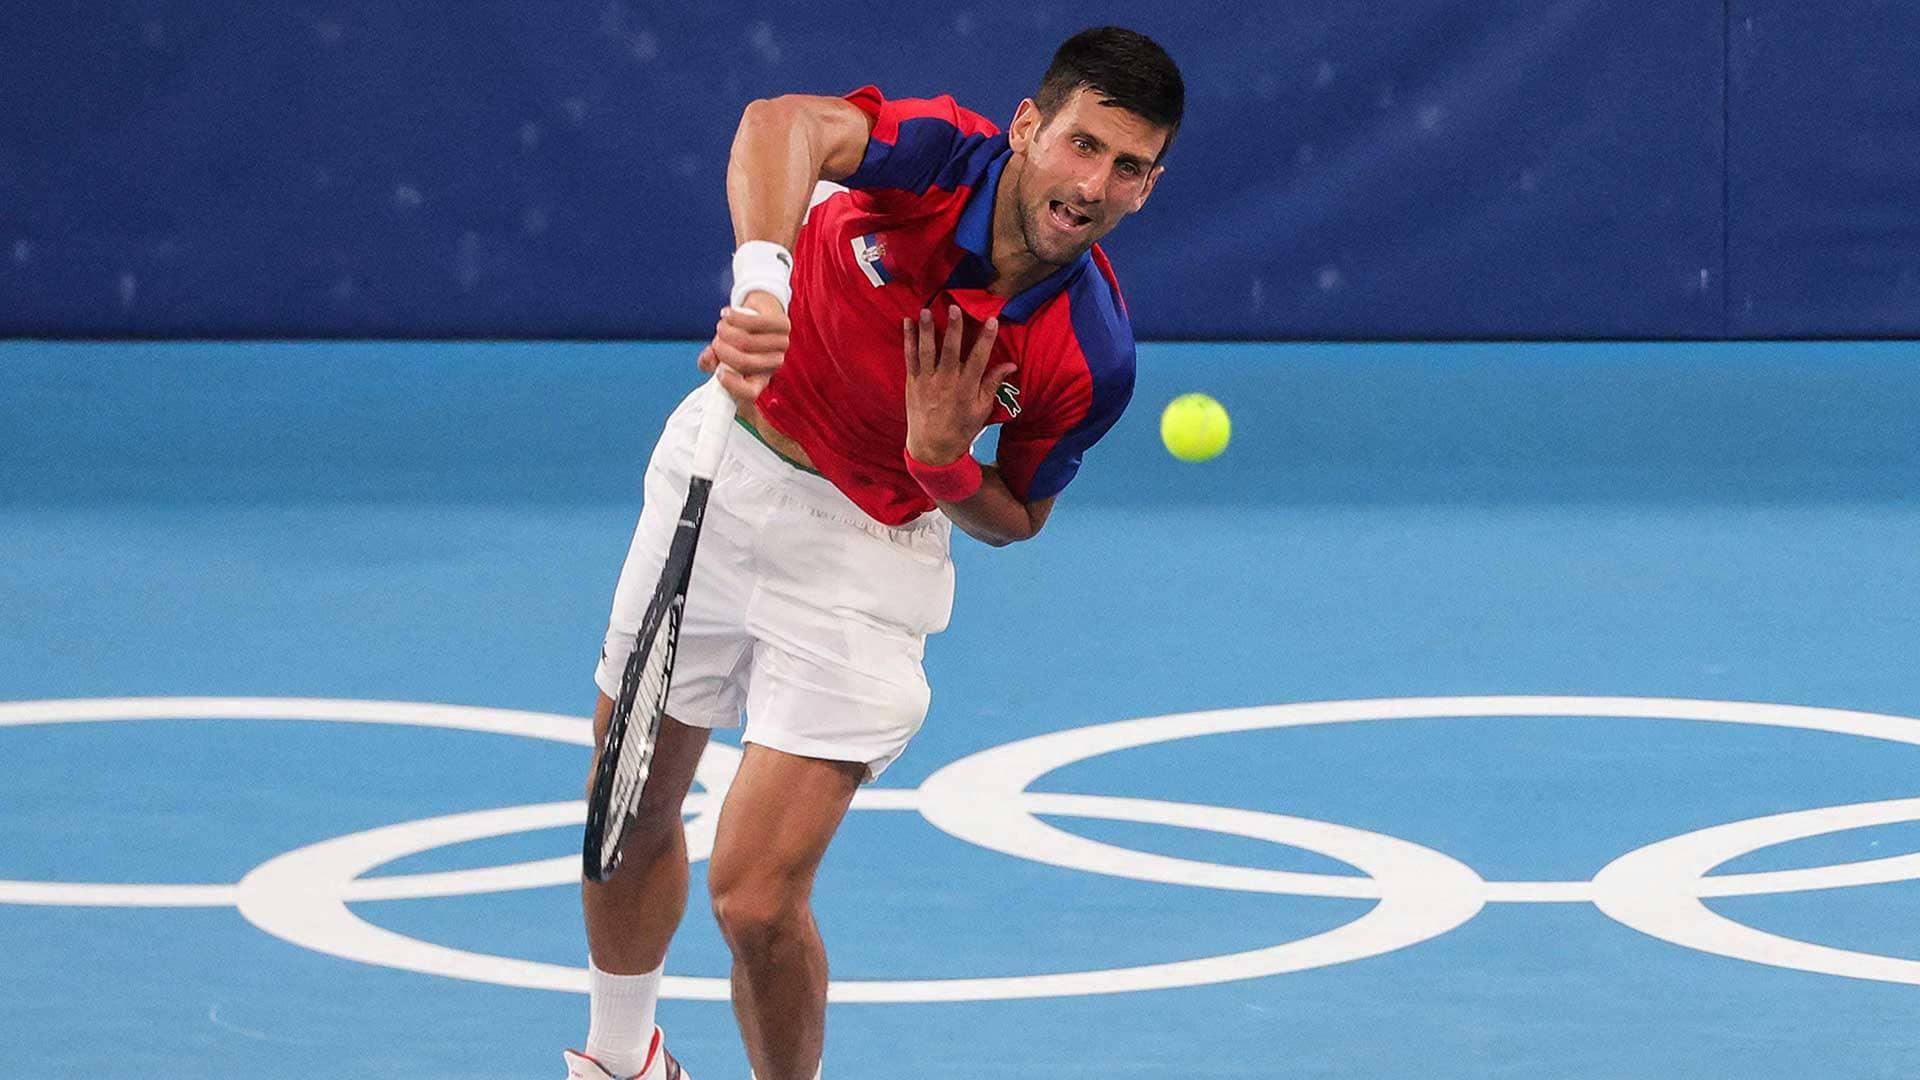 Tokyo Olympics: Djokovic tops Lennard Struff in straight sets